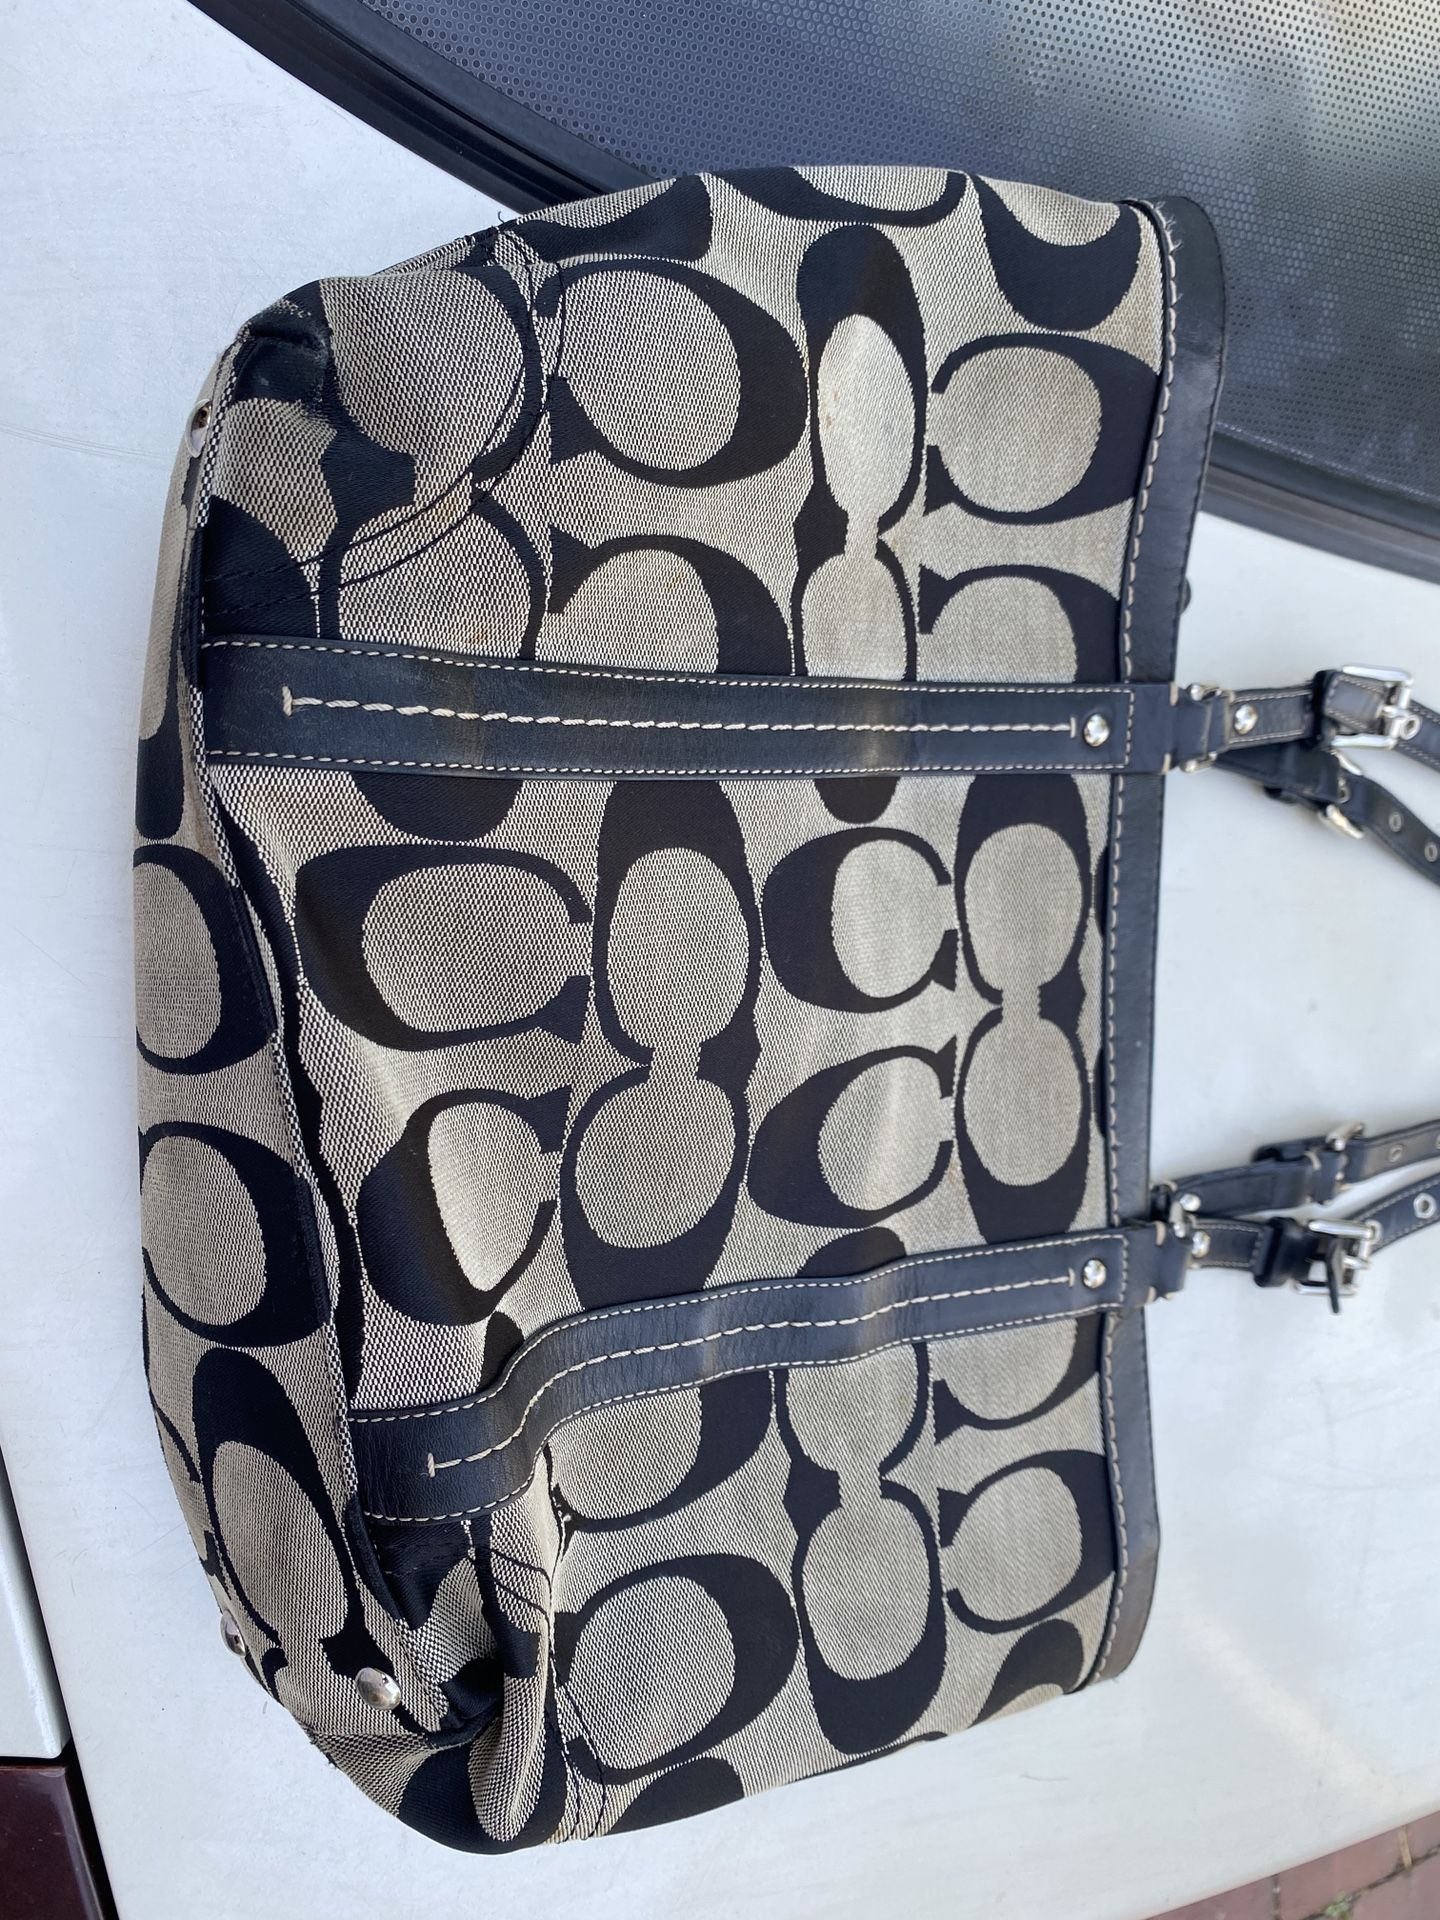 Woman's Coach Bag